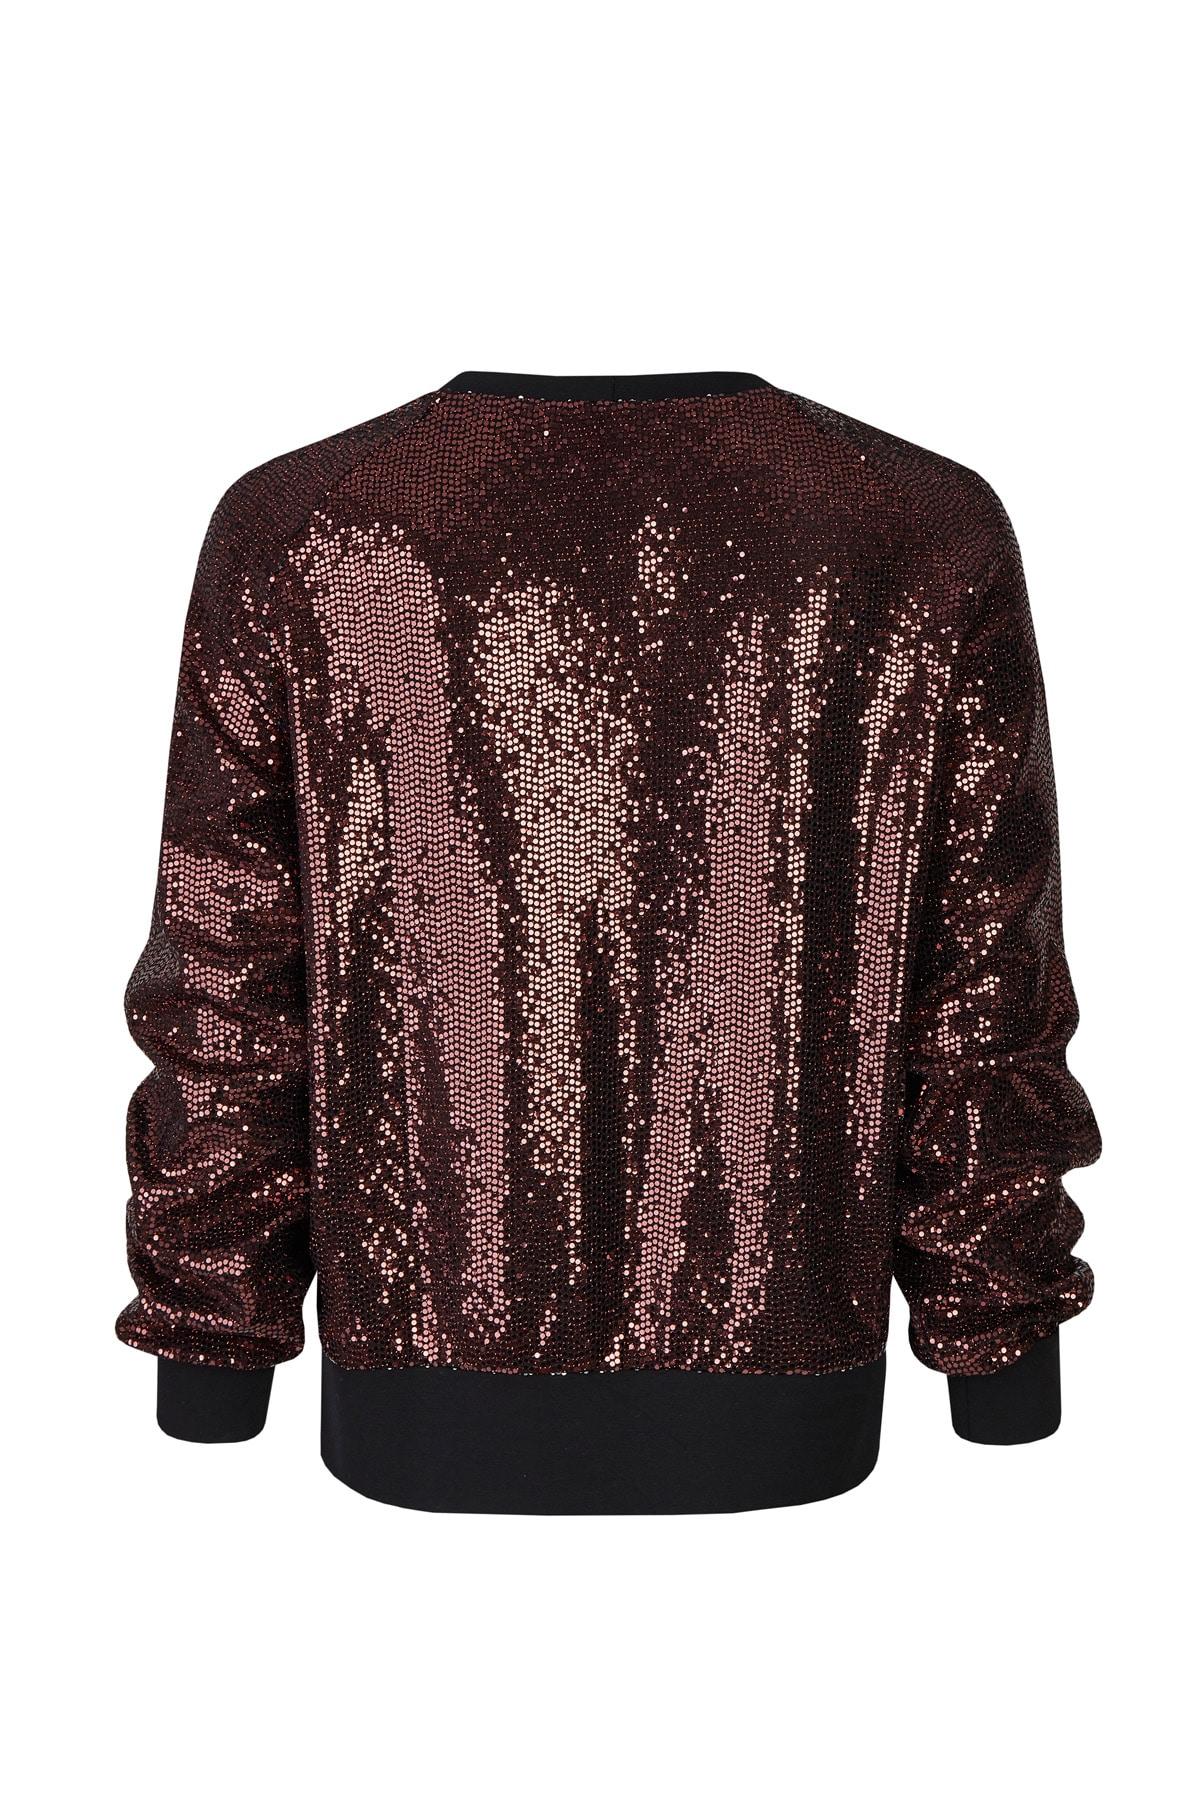 Sweater Paillette Kupfer RT